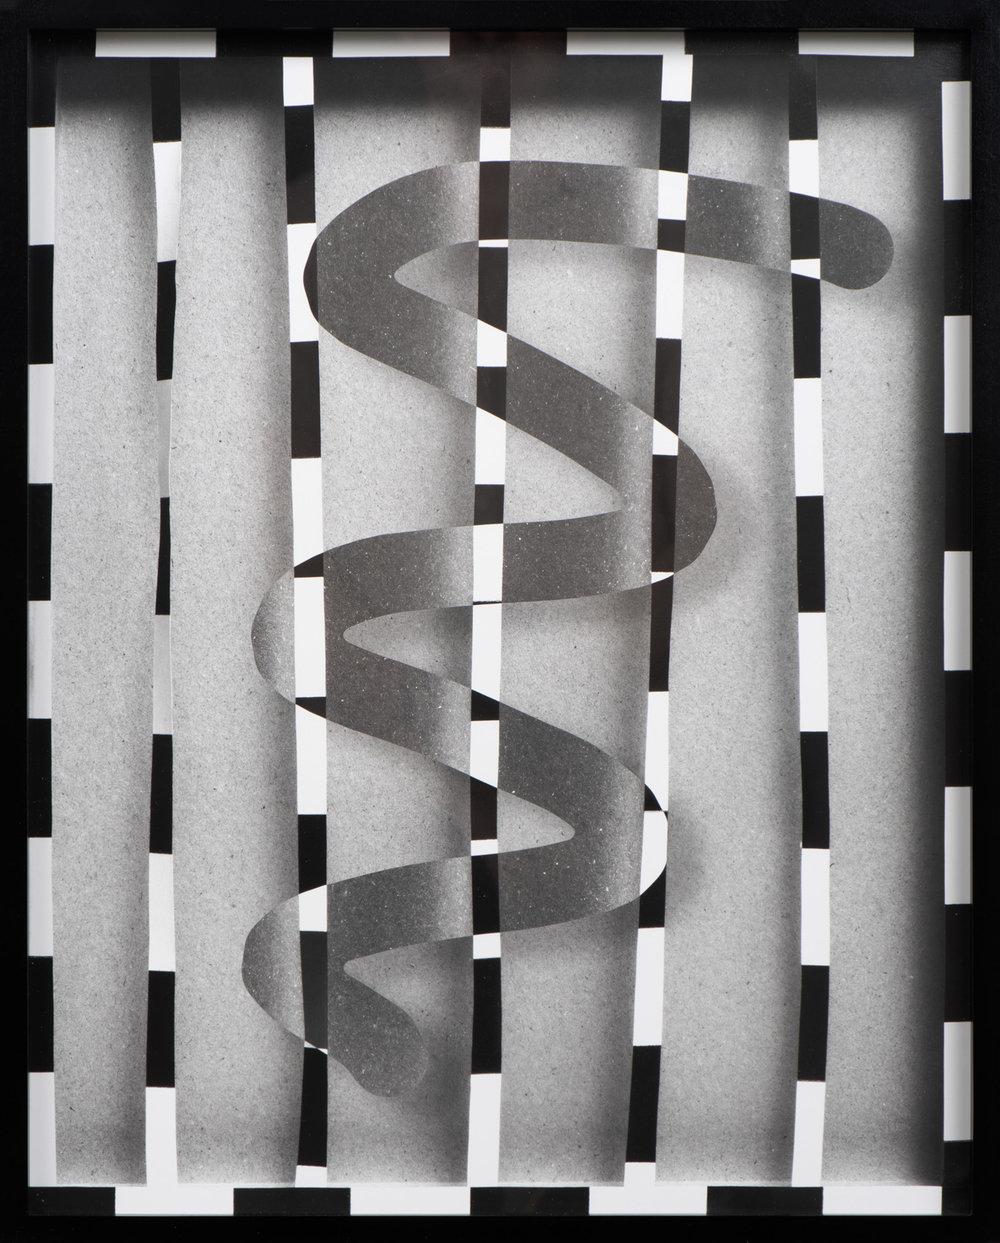 Physical , 2018 Silver gelatin print 20 7/8 x 16 3/4 inches